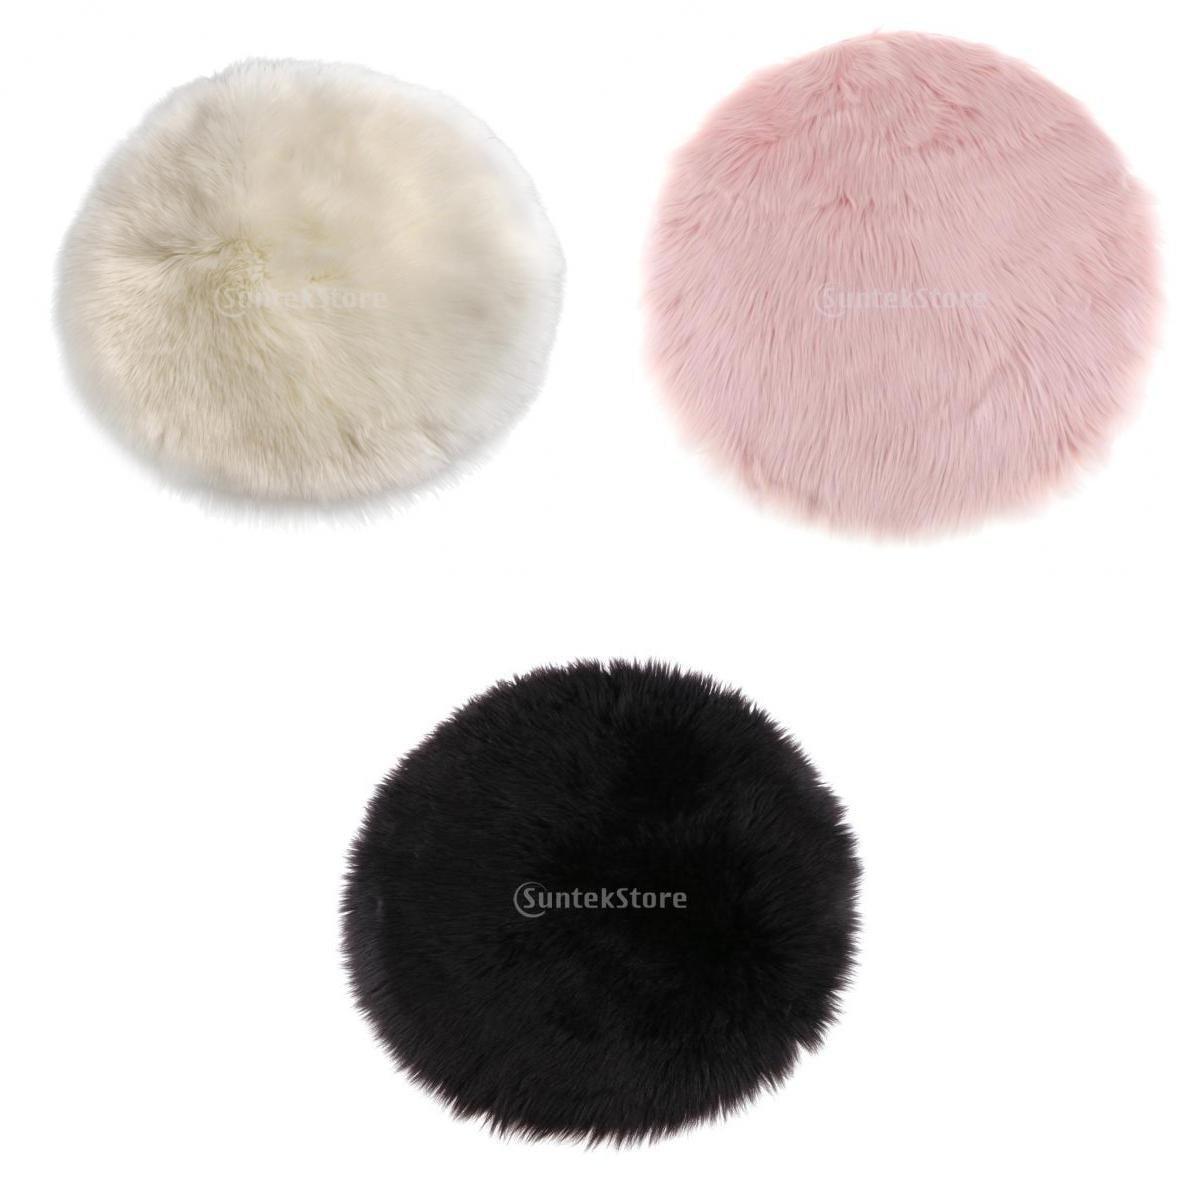 Homyl 3Pieces Super Soft Faux Fur Sheepskin Sofa Chair Cover Rug / Shaggy Area Rugs - Round Shaped